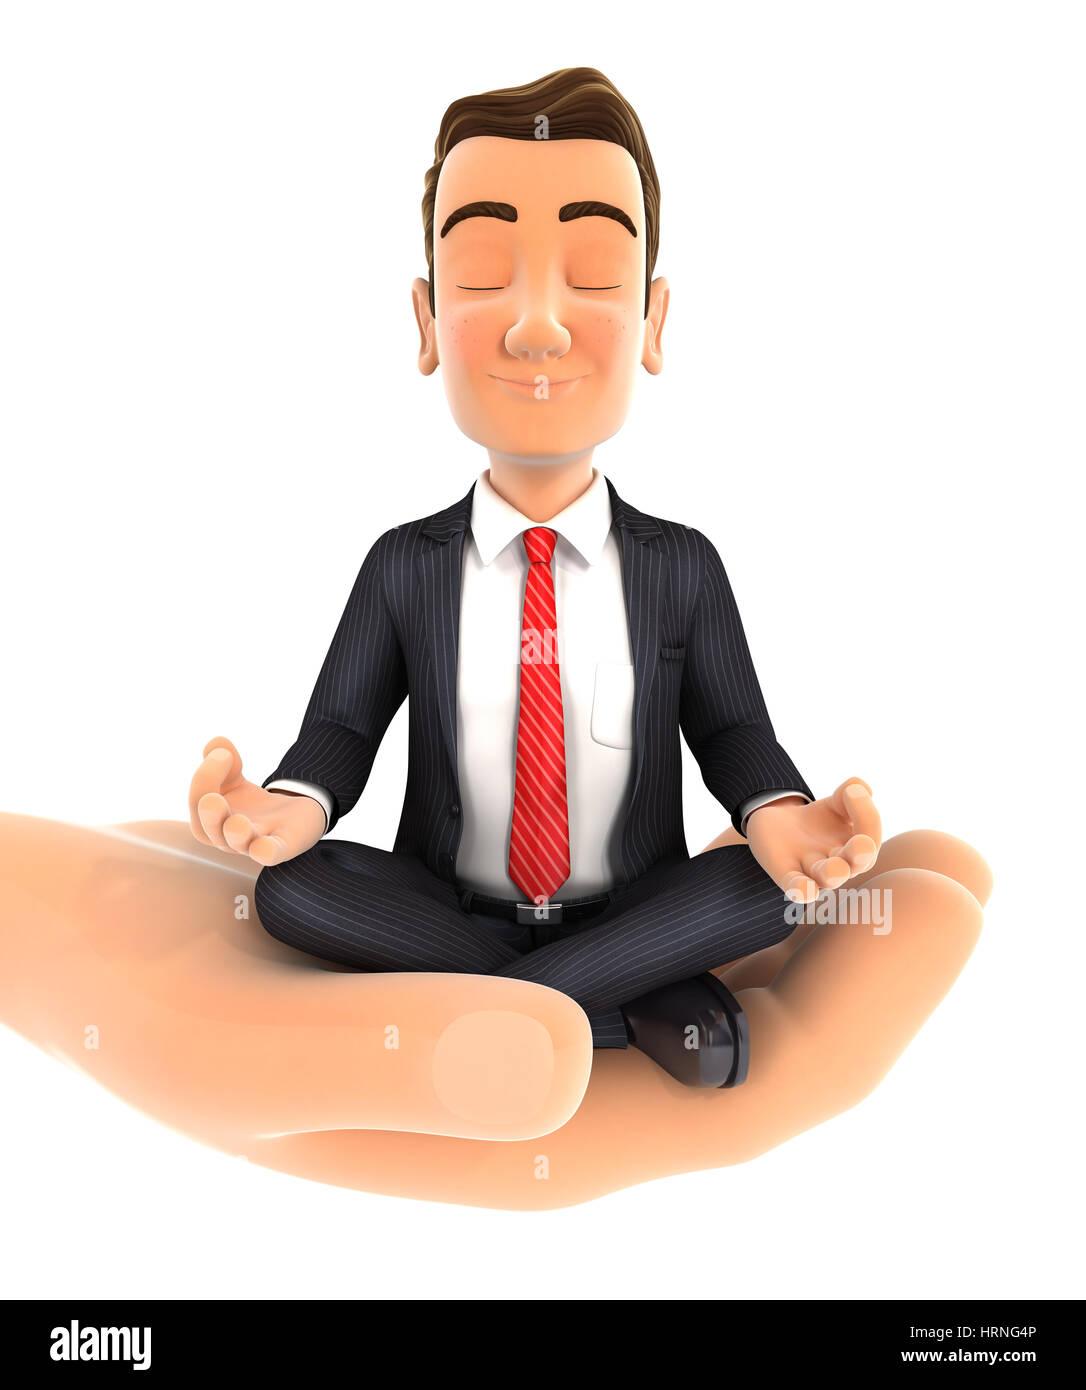 3d hand holding businessman doing yoga, illustration with isolated white background Stock Photo